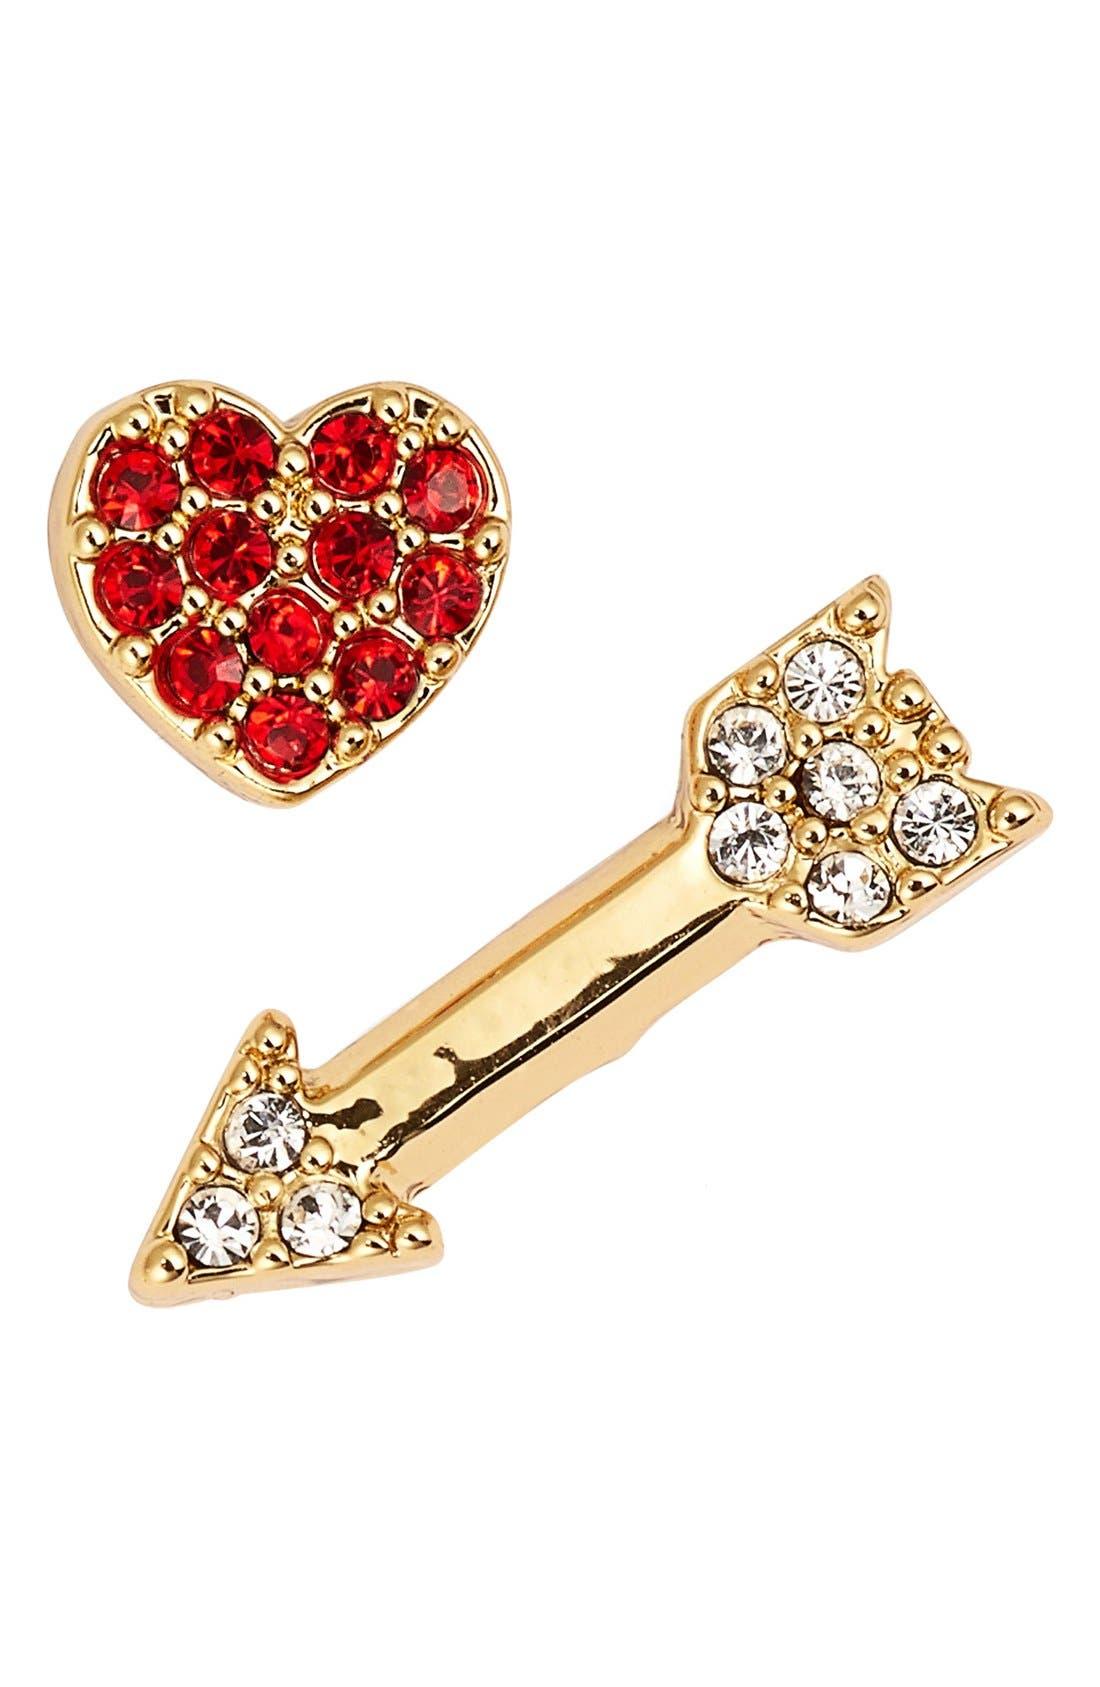 Alternate Image 1 Selected - kate spade new york 'love list' heart & arrow mismatched stud earrings